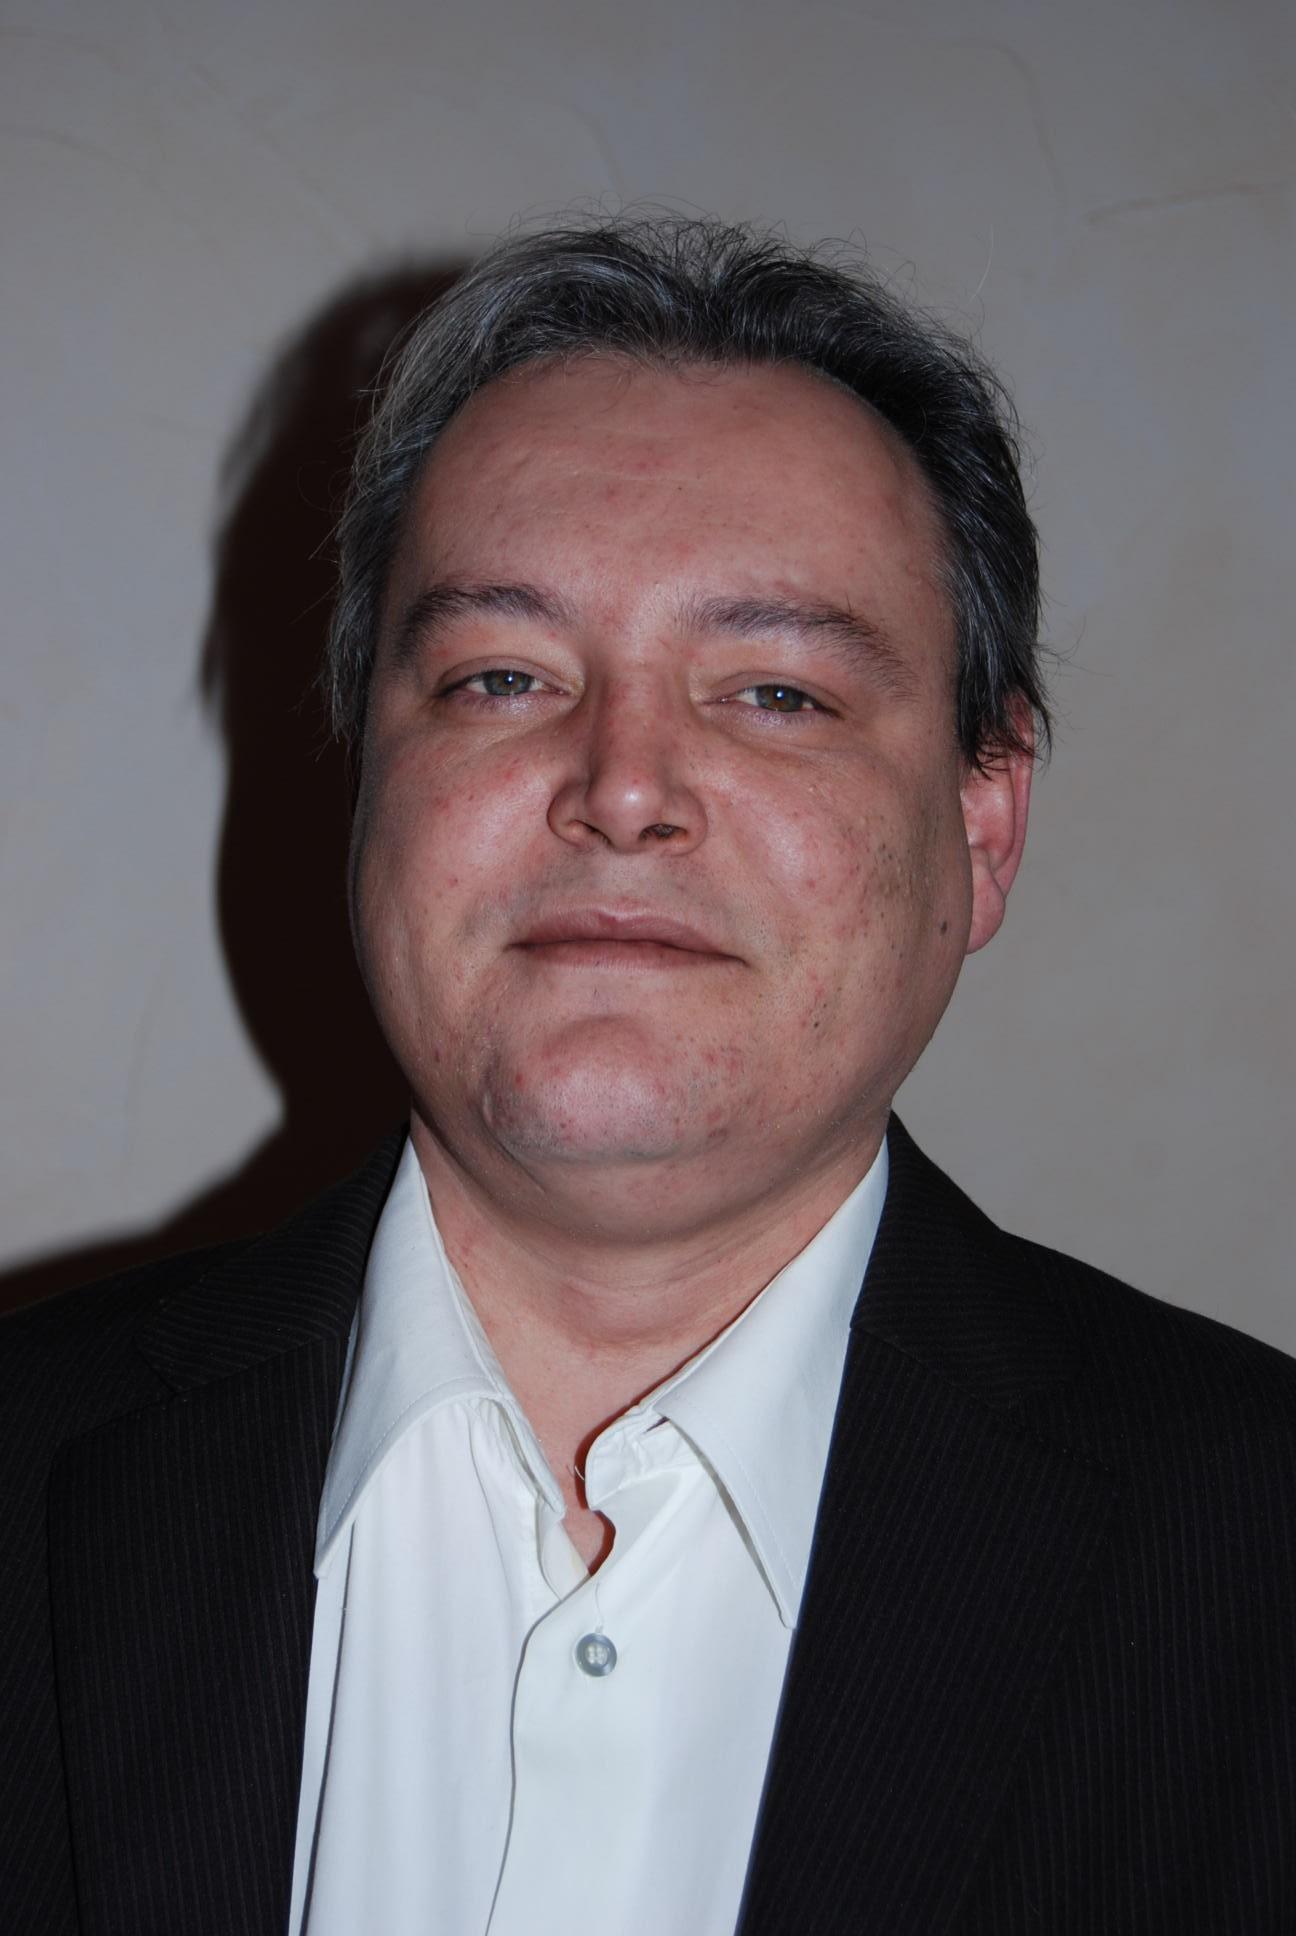 Patrick Laffitte